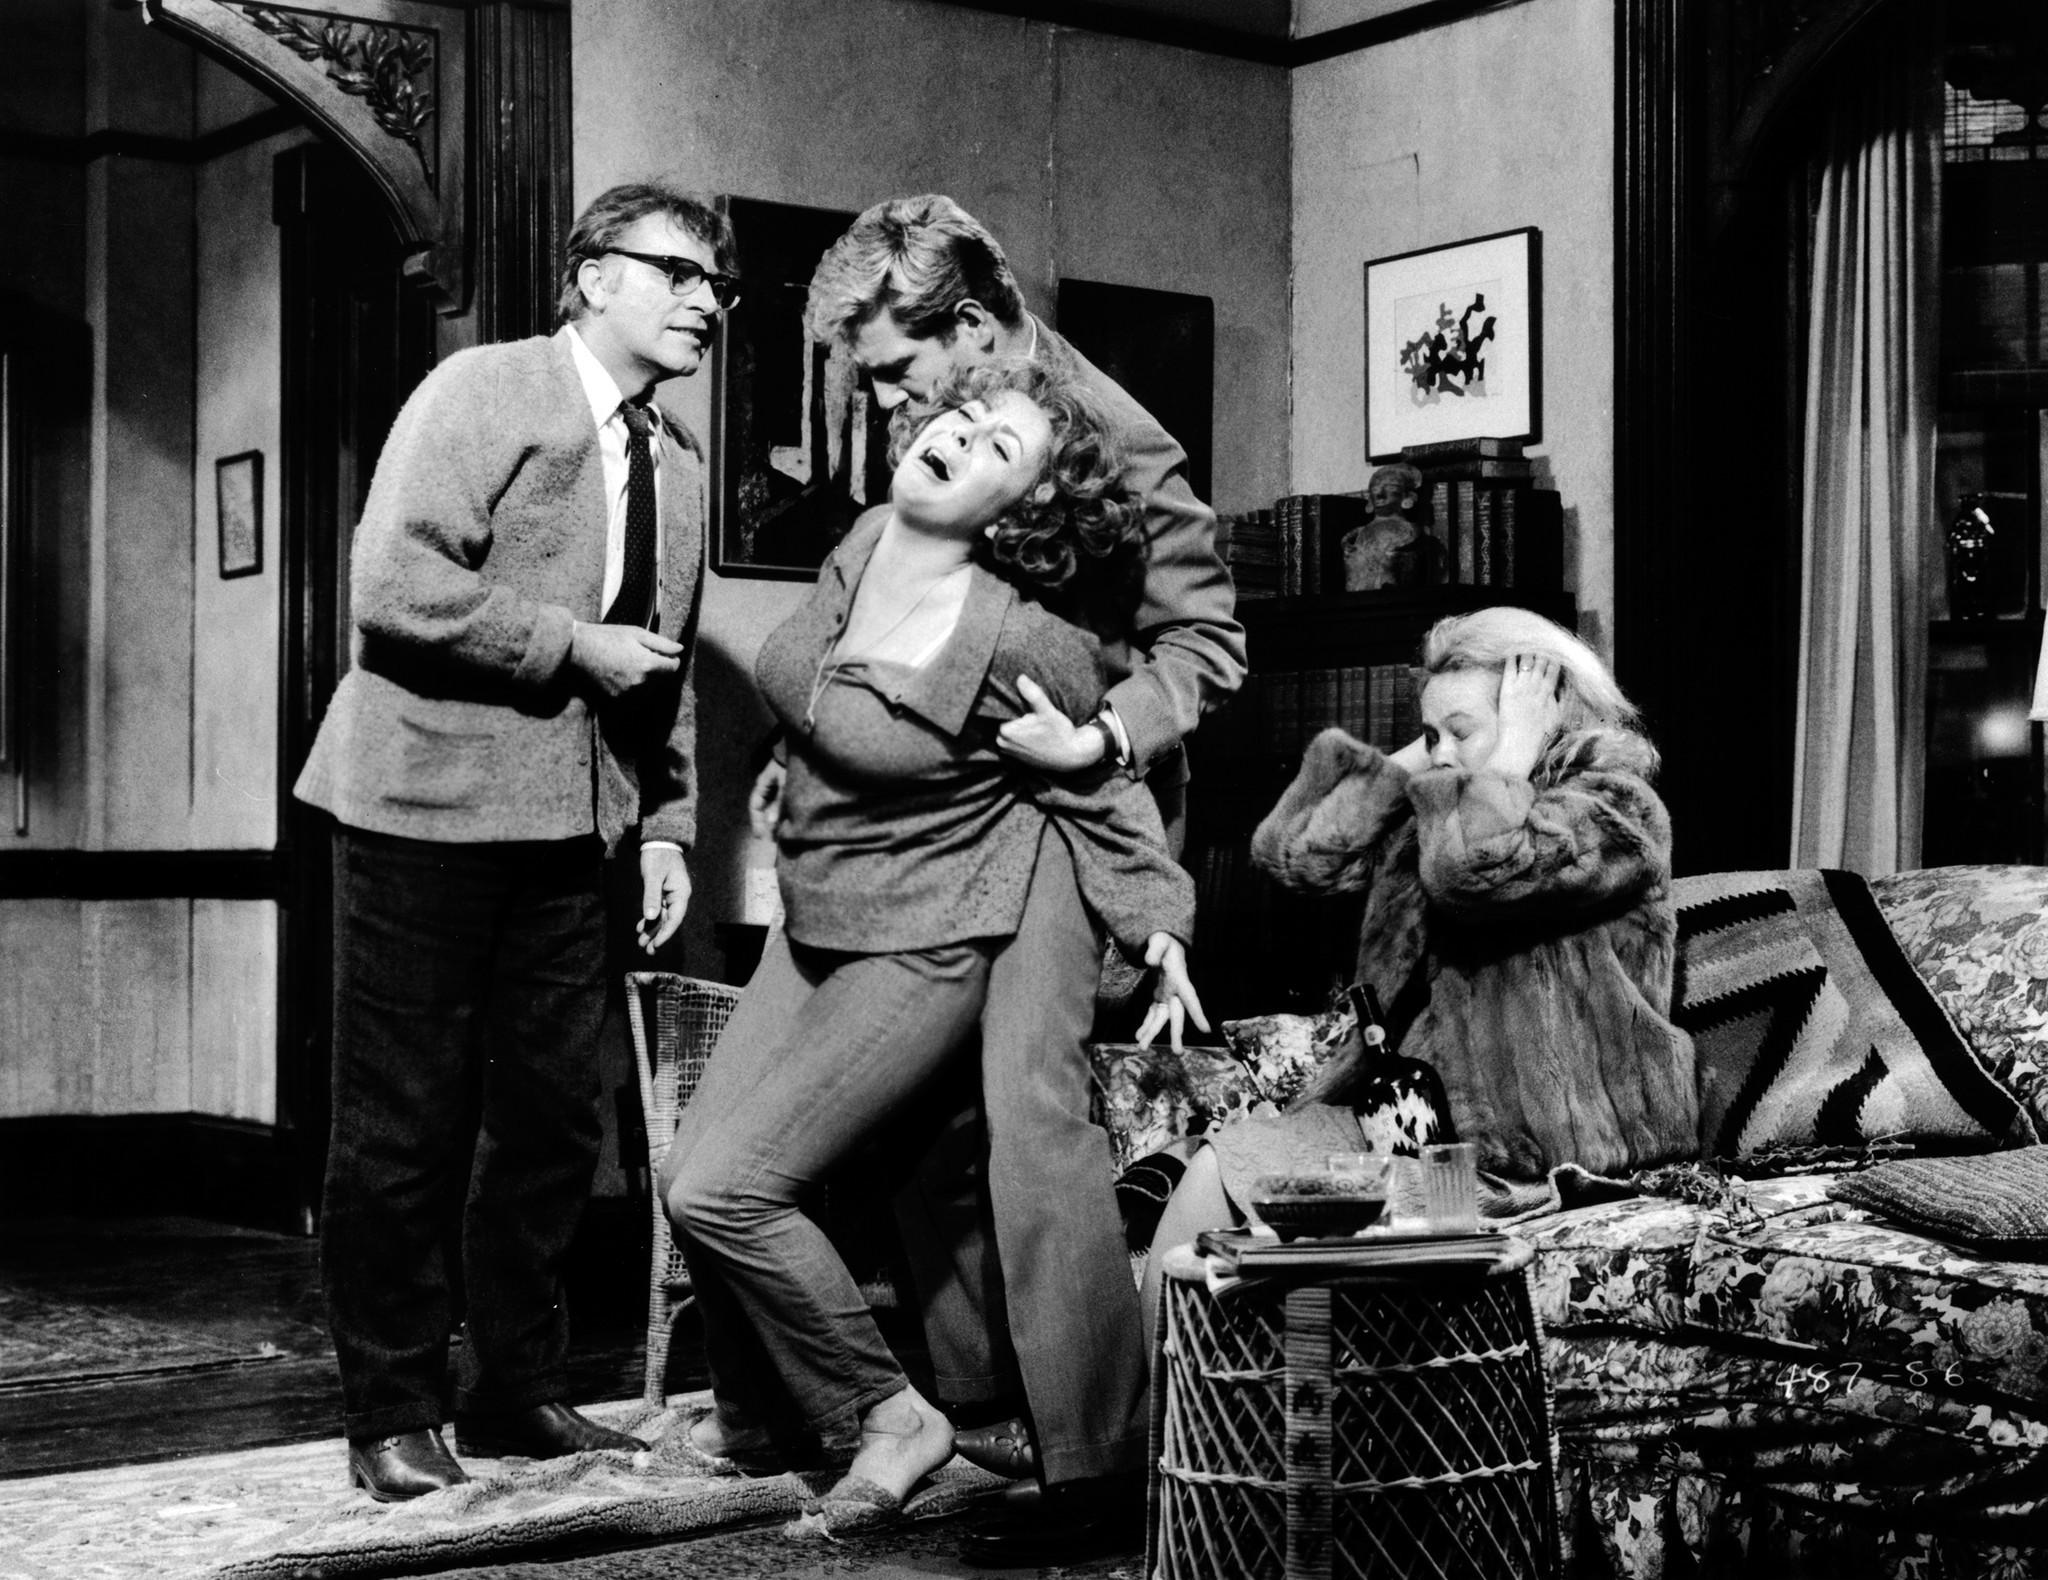 The 1966 movie adaptation of